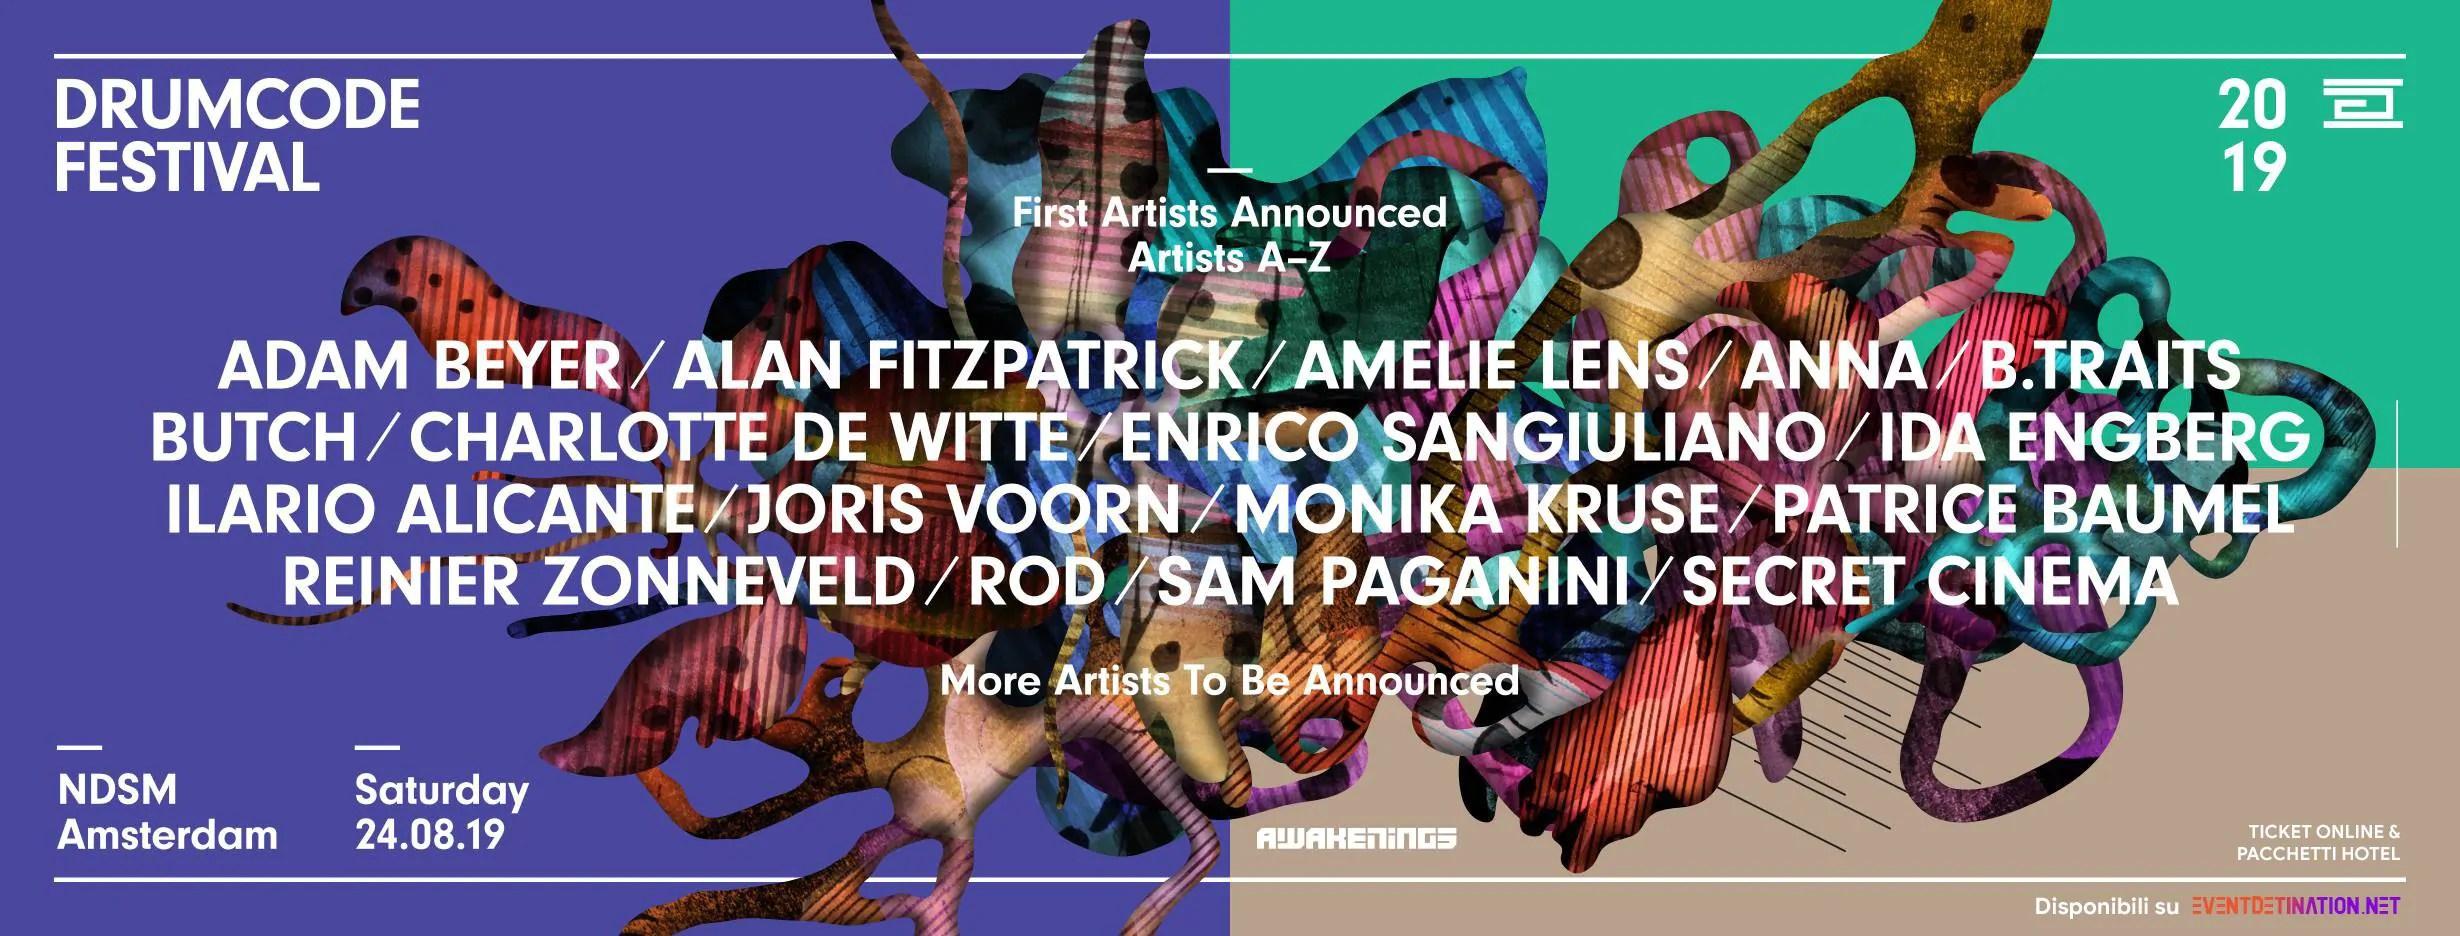 DRUMCODE FESTIVAL Amsterdam 2019 – Ticket Pacchetti Hotel